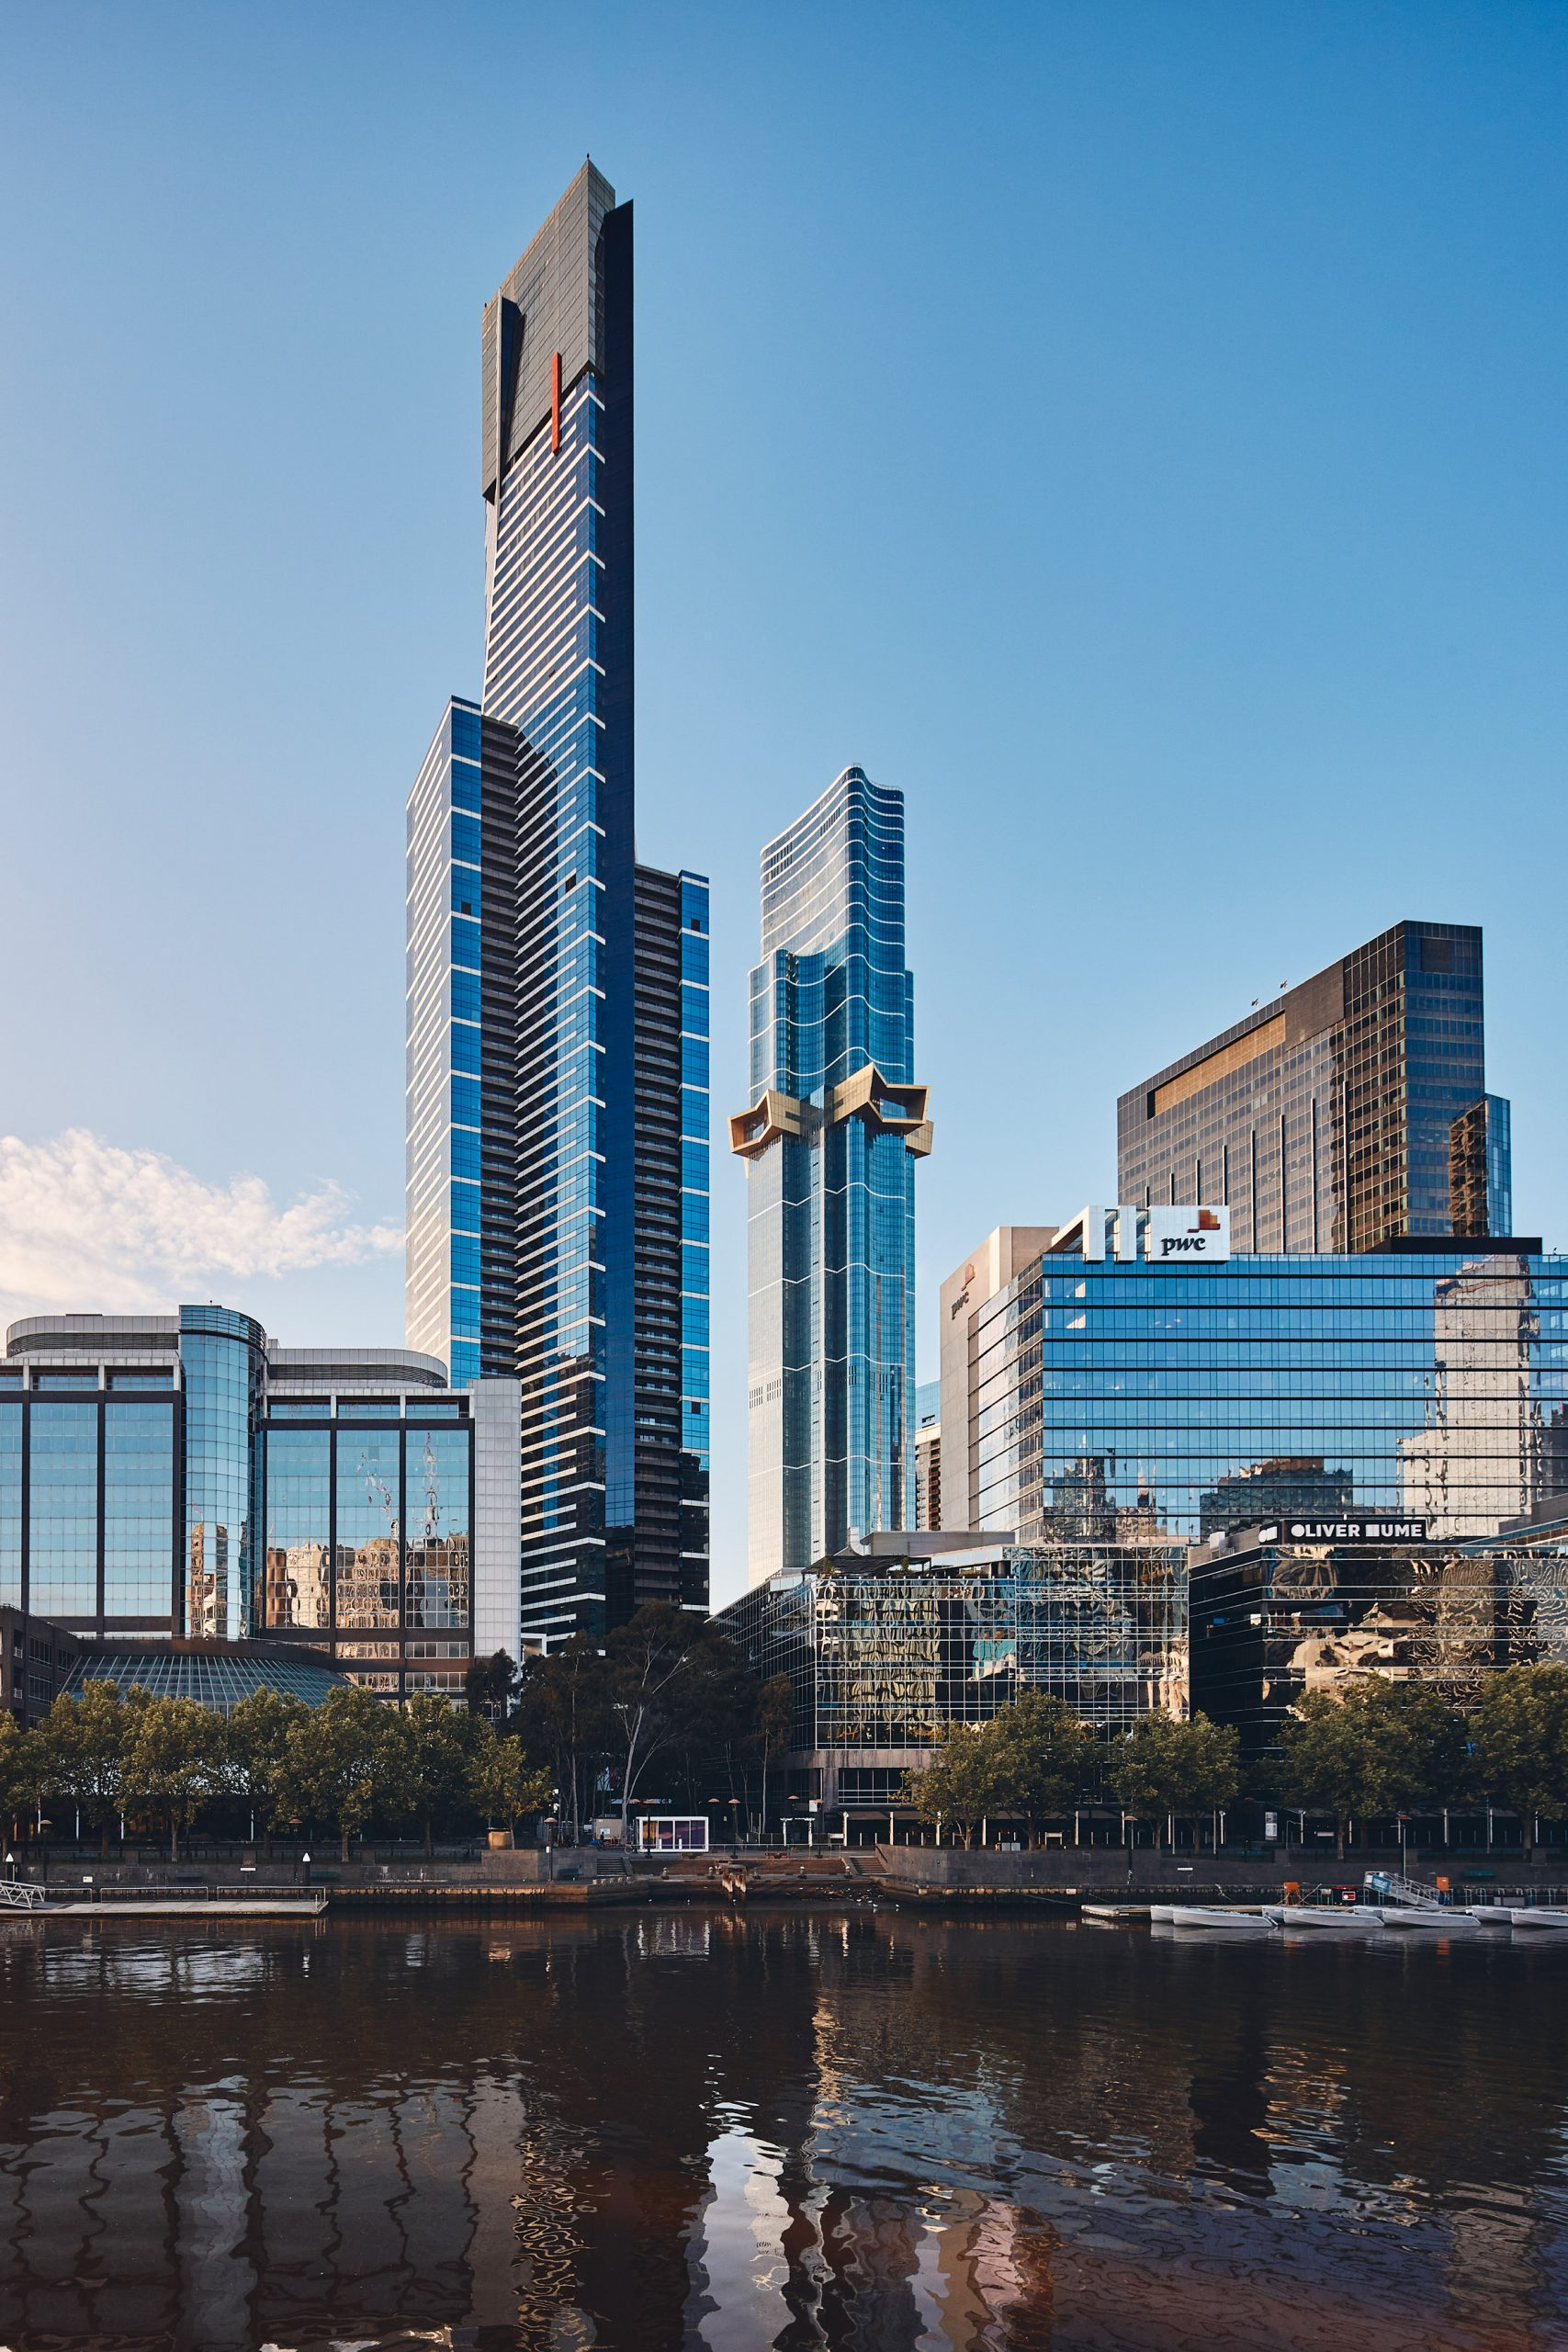 The star design was informed by the Australian flag by Fender Katsalidis